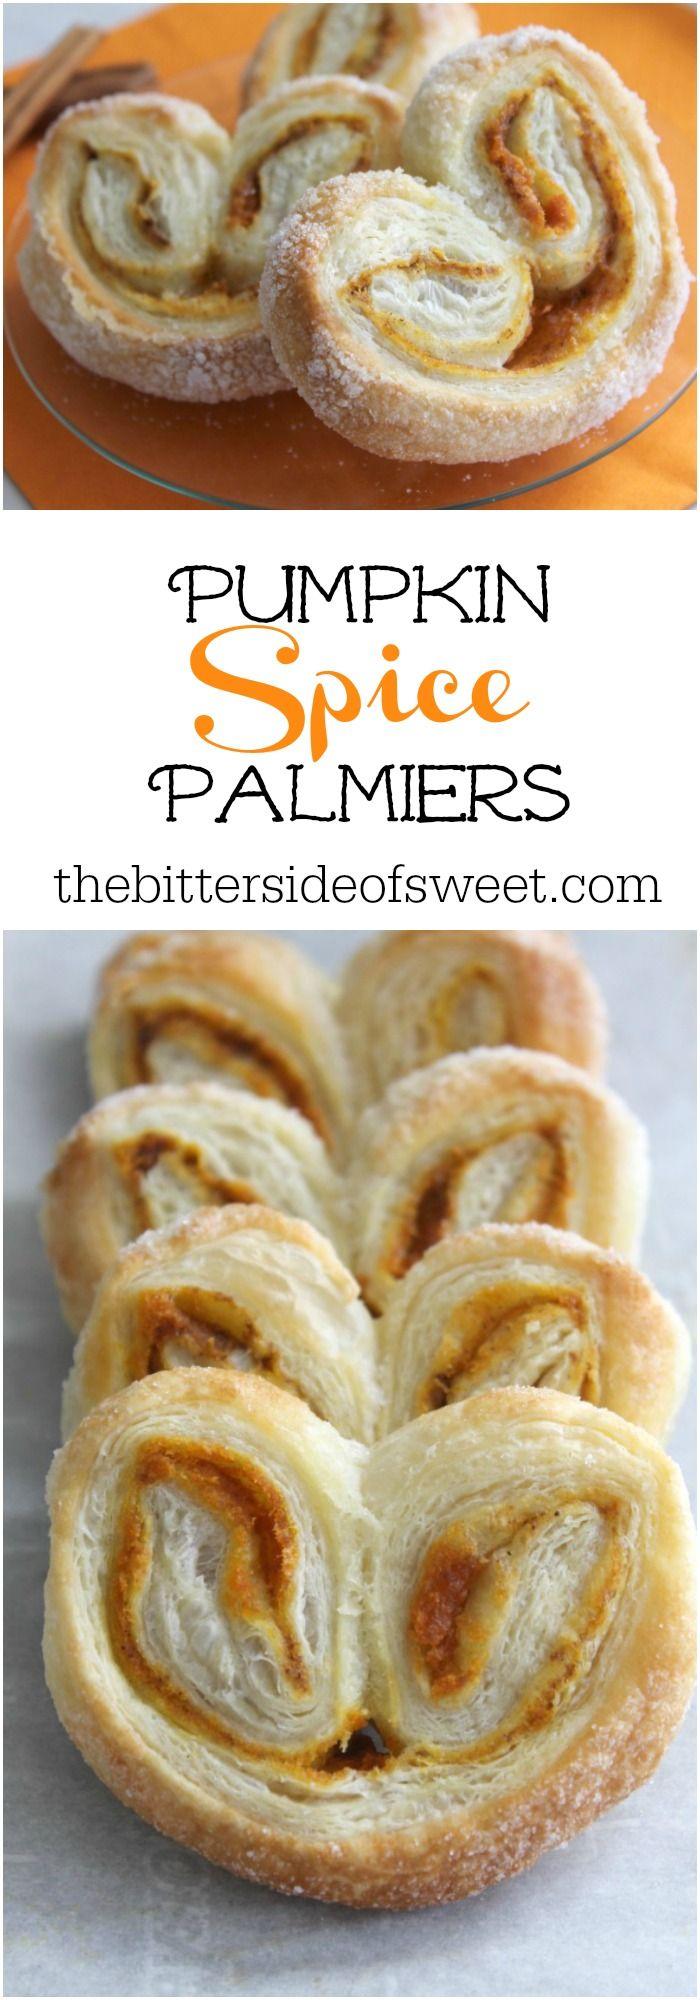 Pumpkin Spice Palmiers | The Bitter Side of Sweet